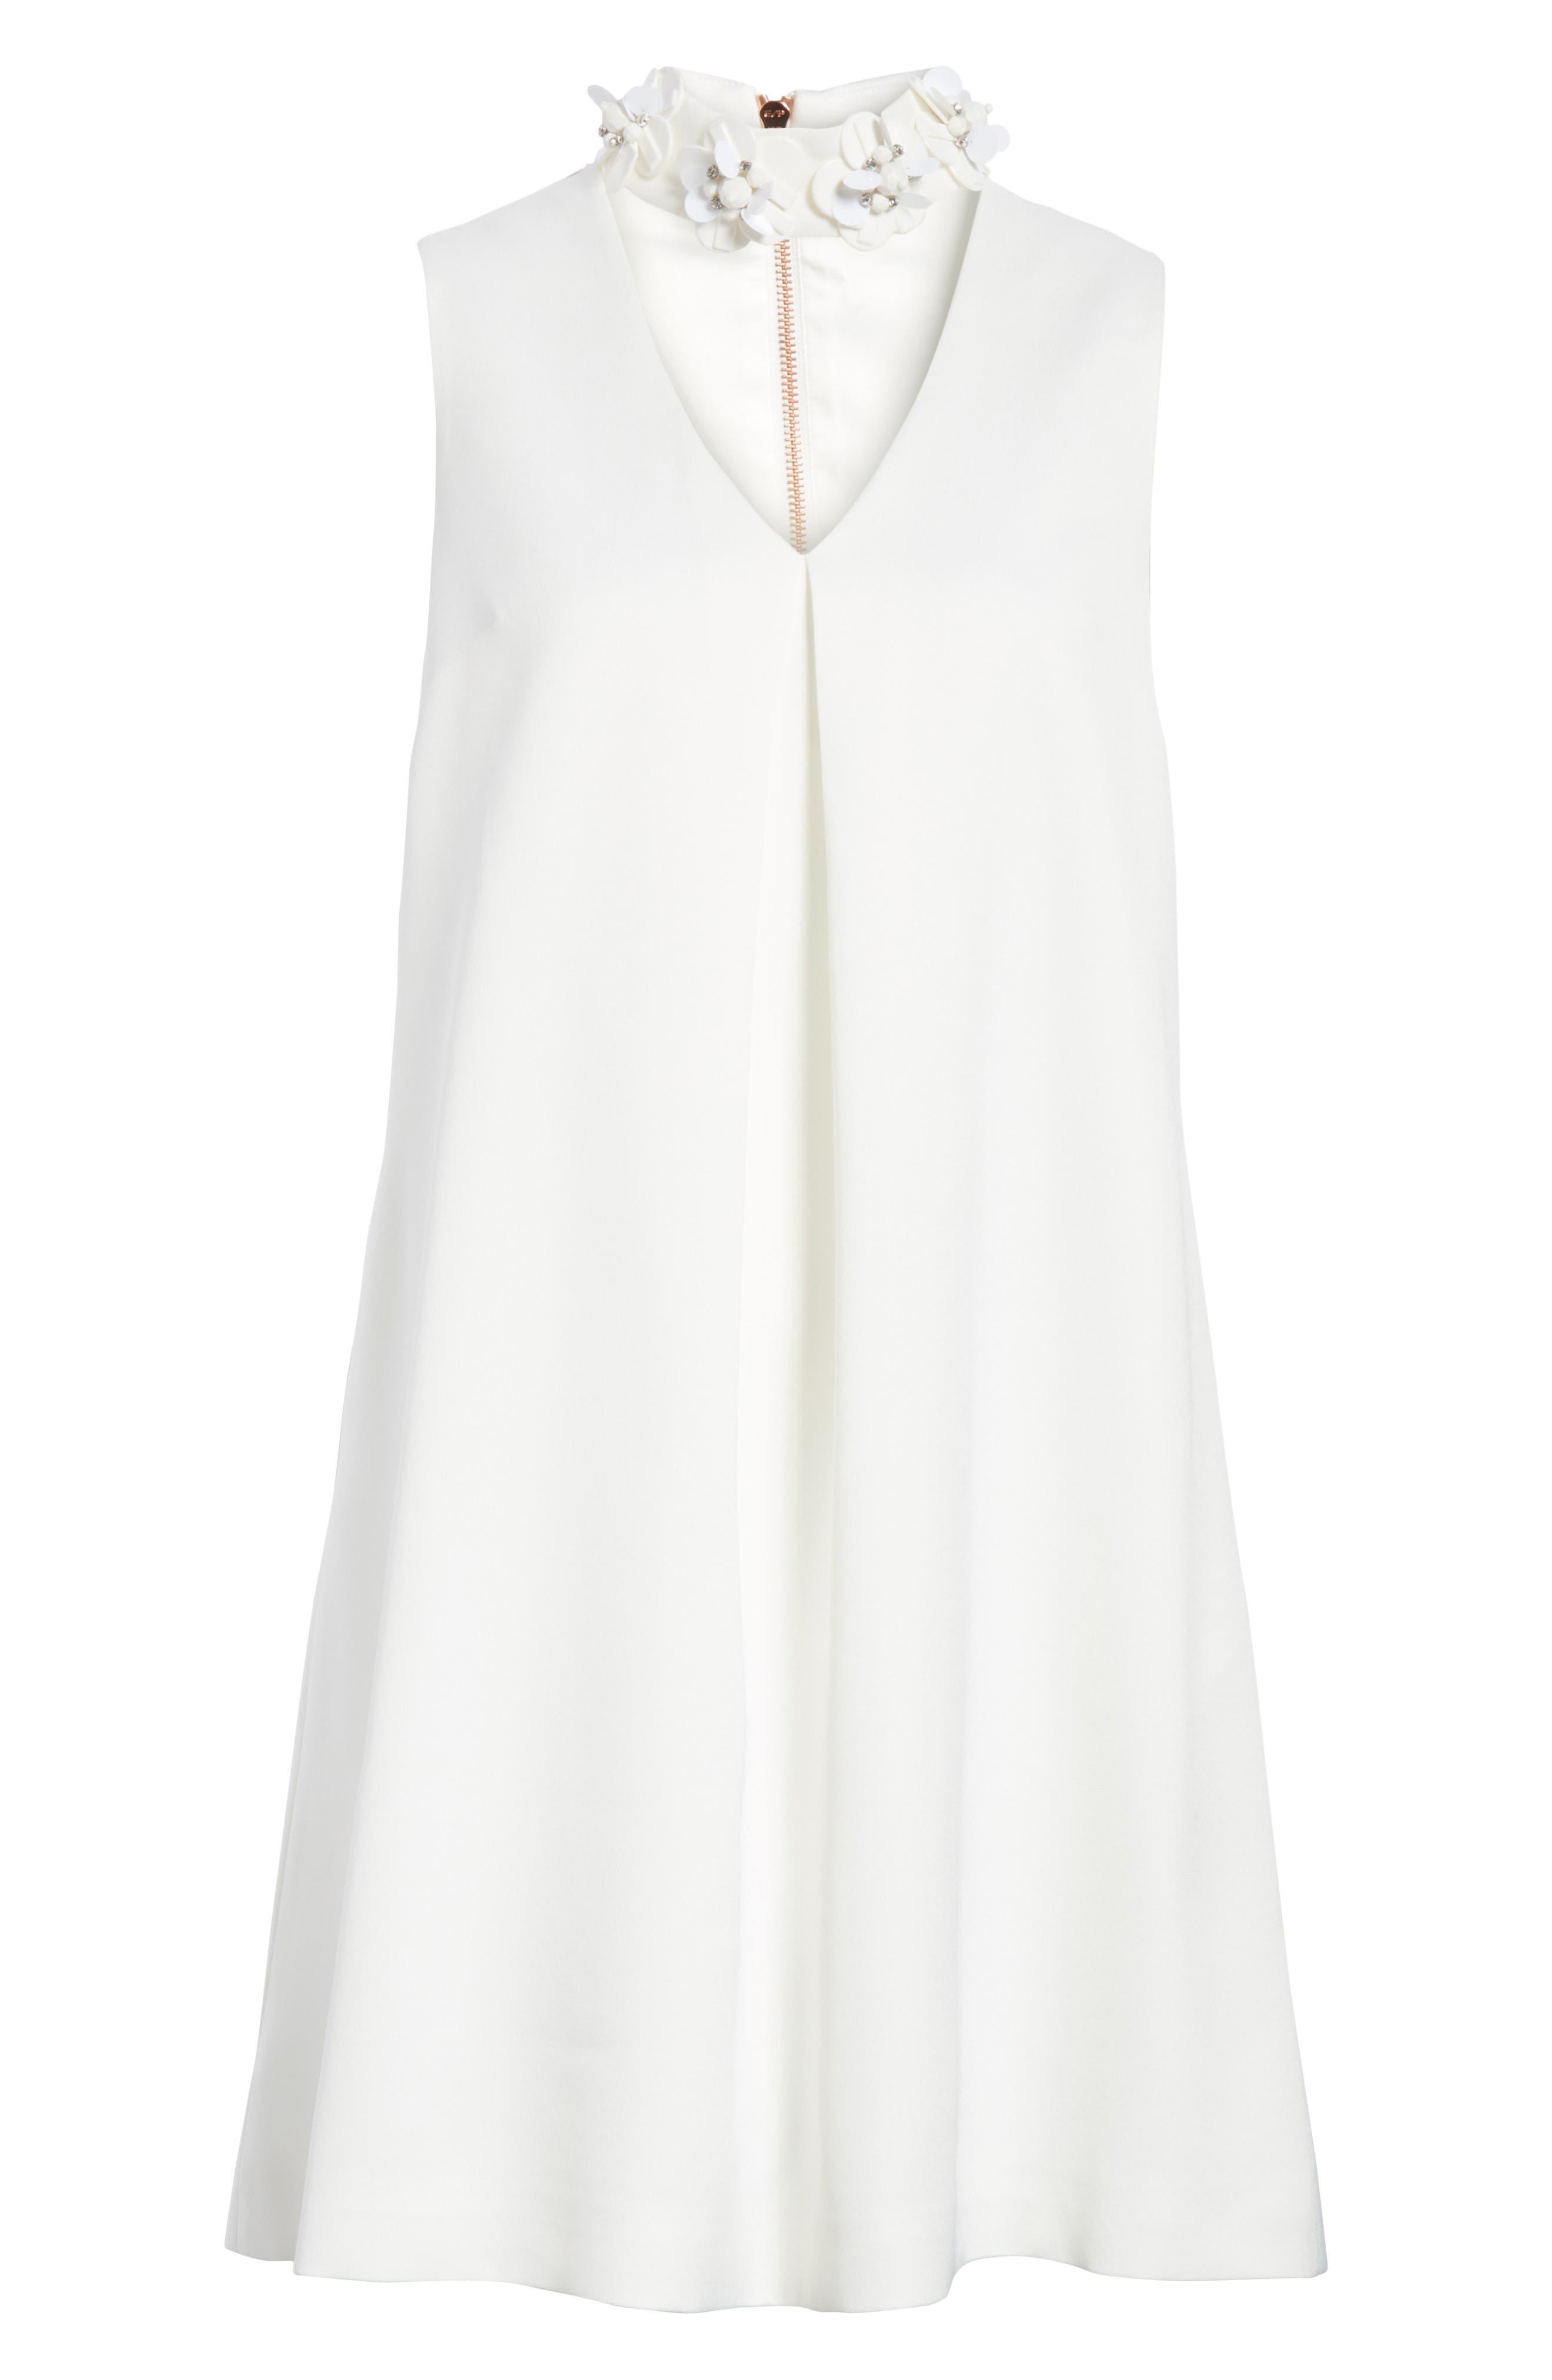 Embellished Neck A-Line Tunic Dress,                             Alternate thumbnail 6, color,                             White